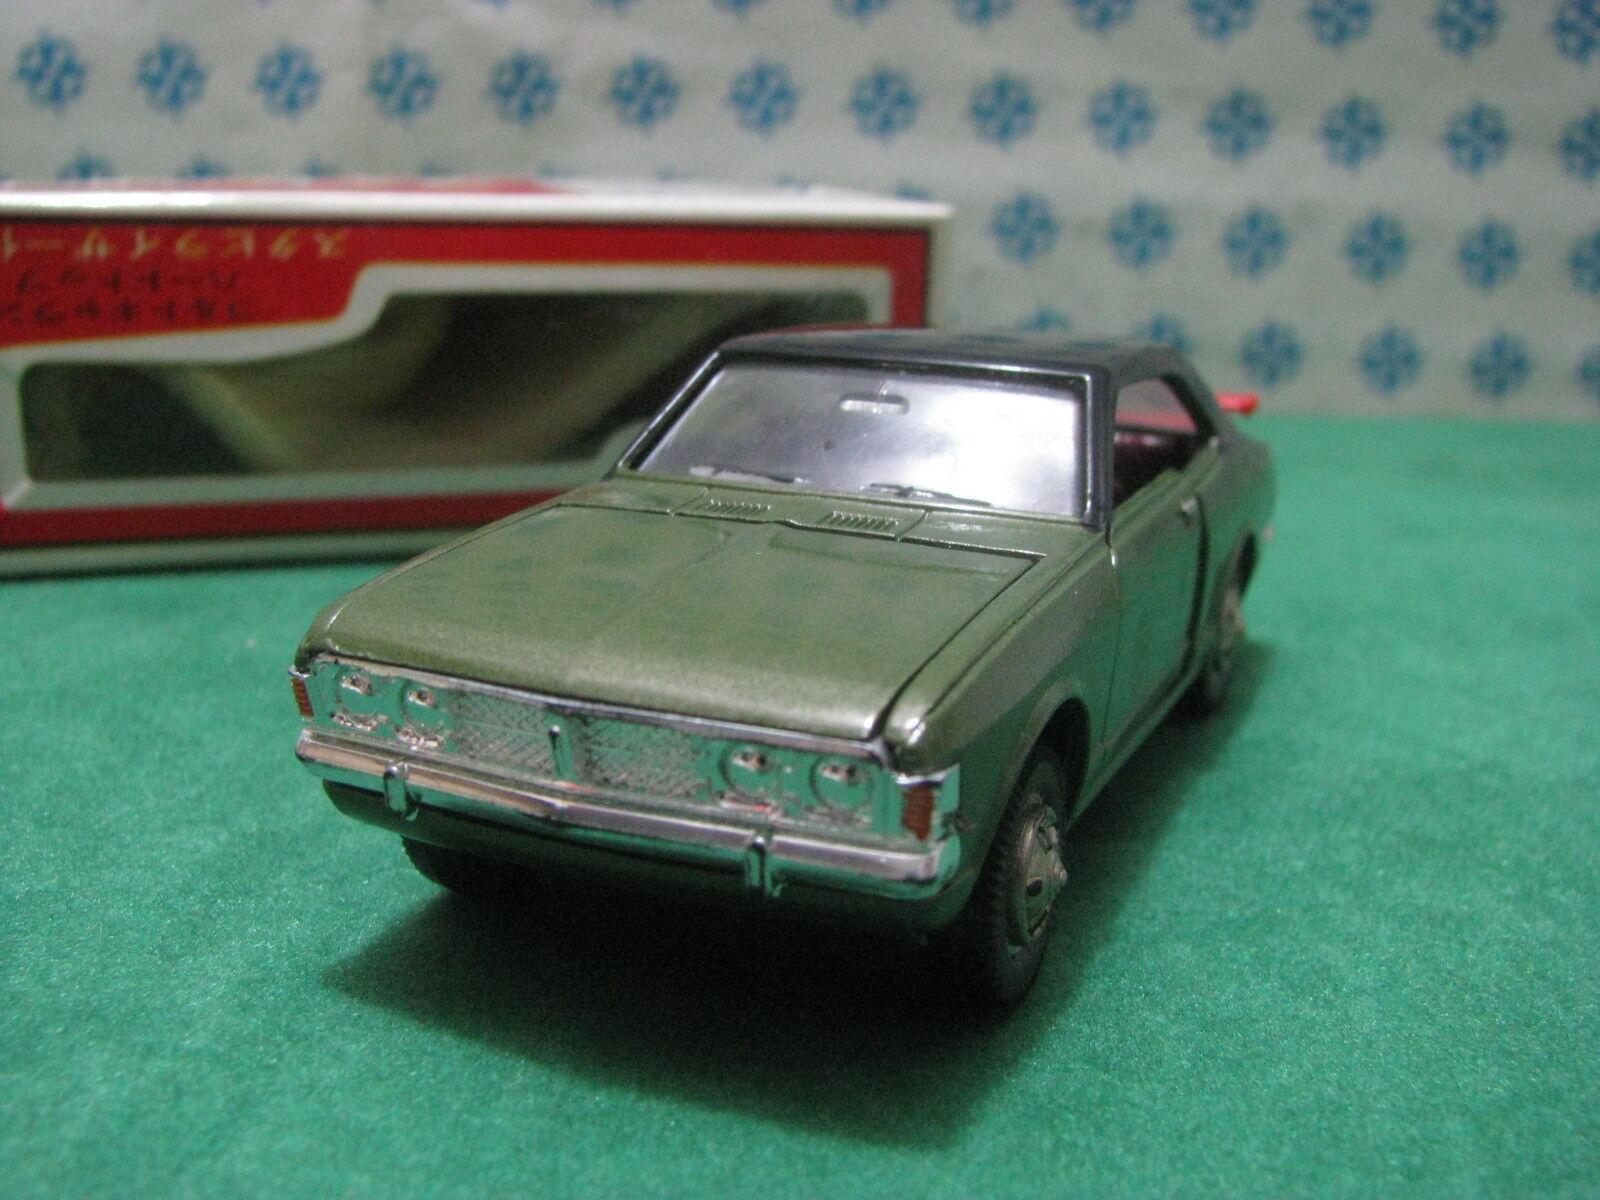 Vintage - GALANT GALANT GALANT Hard Top - 1 40 Diapet Yonezawa toys n°276 6cecd6